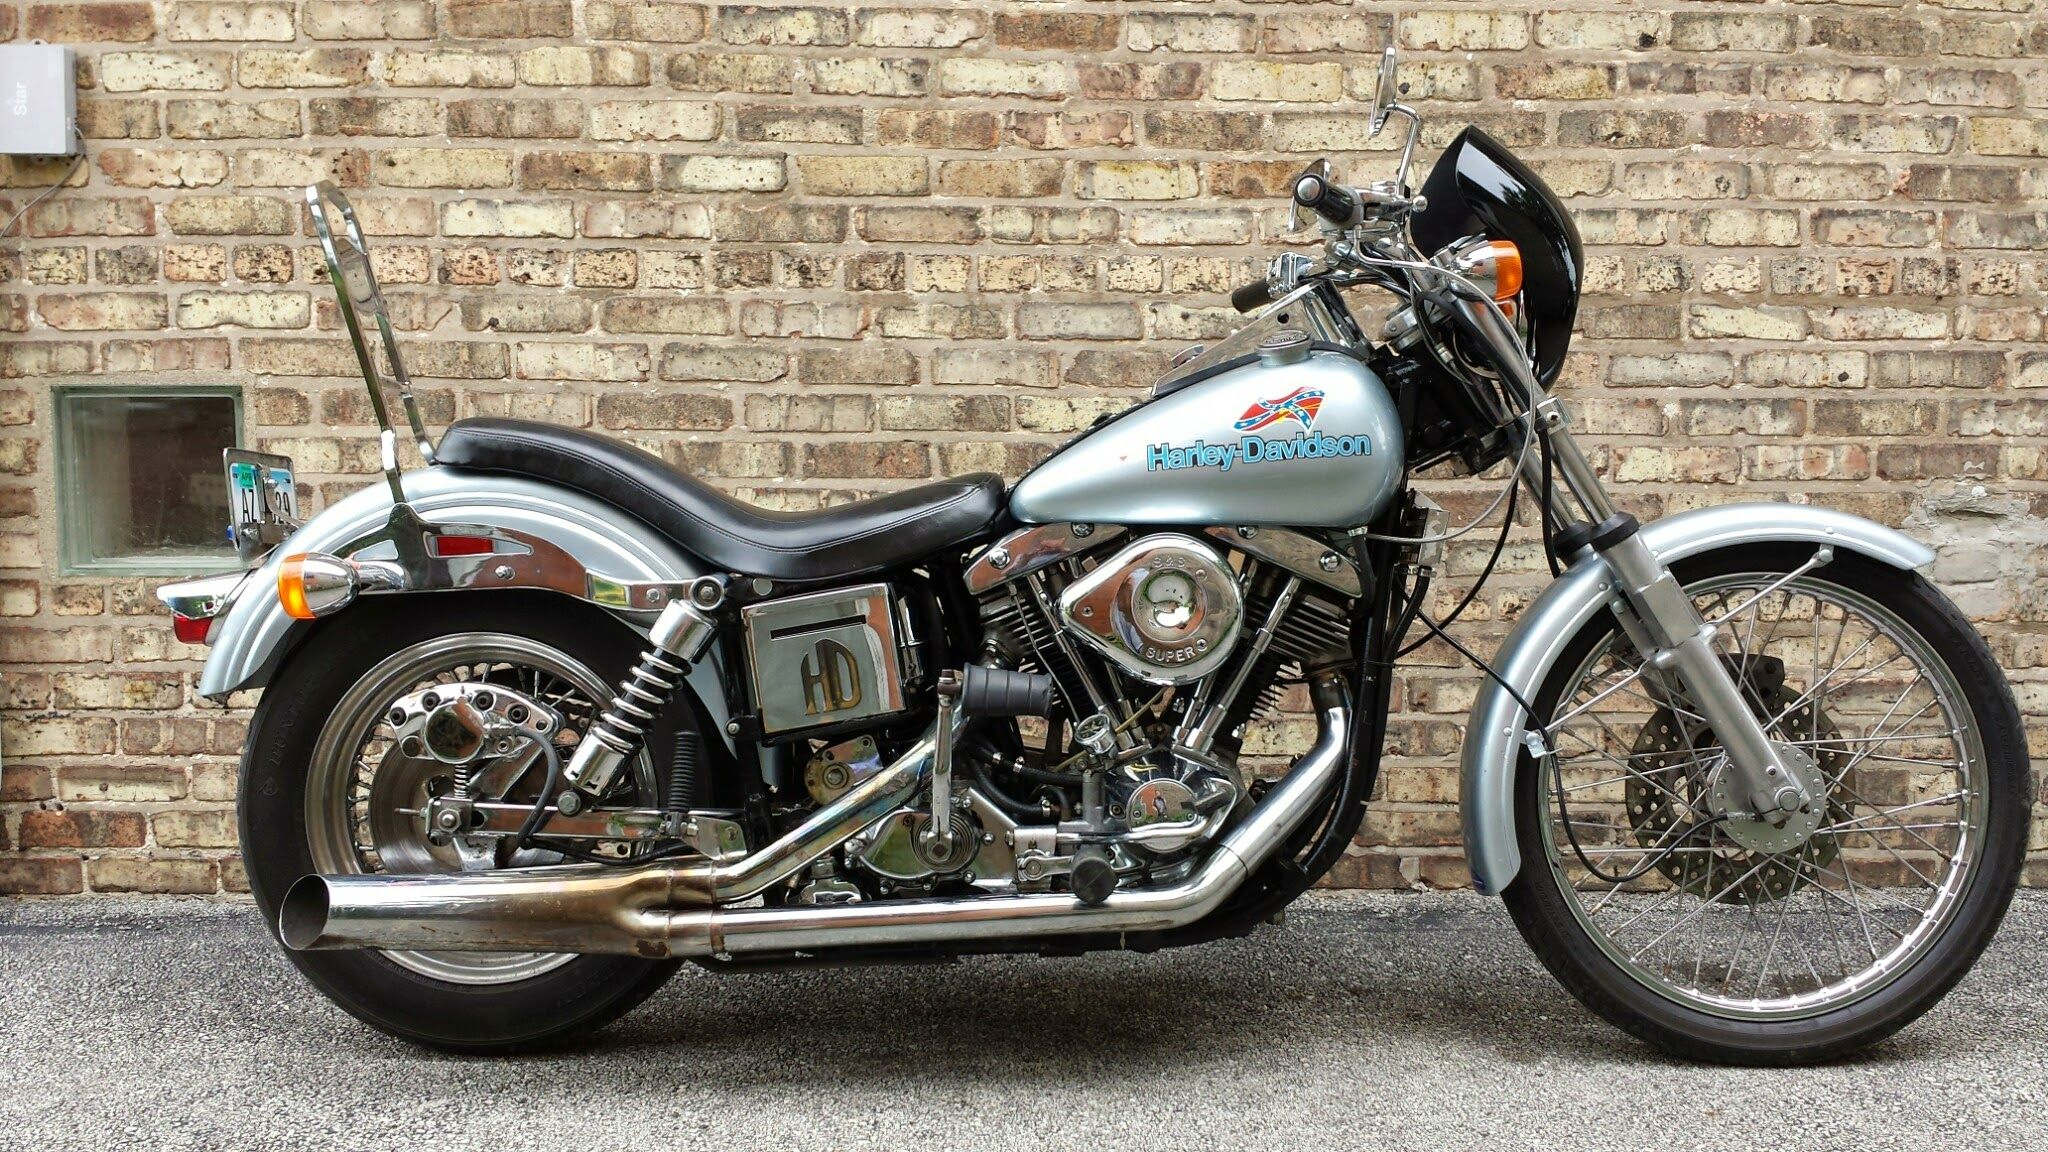 Classic Harley Davidson FXE 1200 Superglide Shovelhead AMF for sale